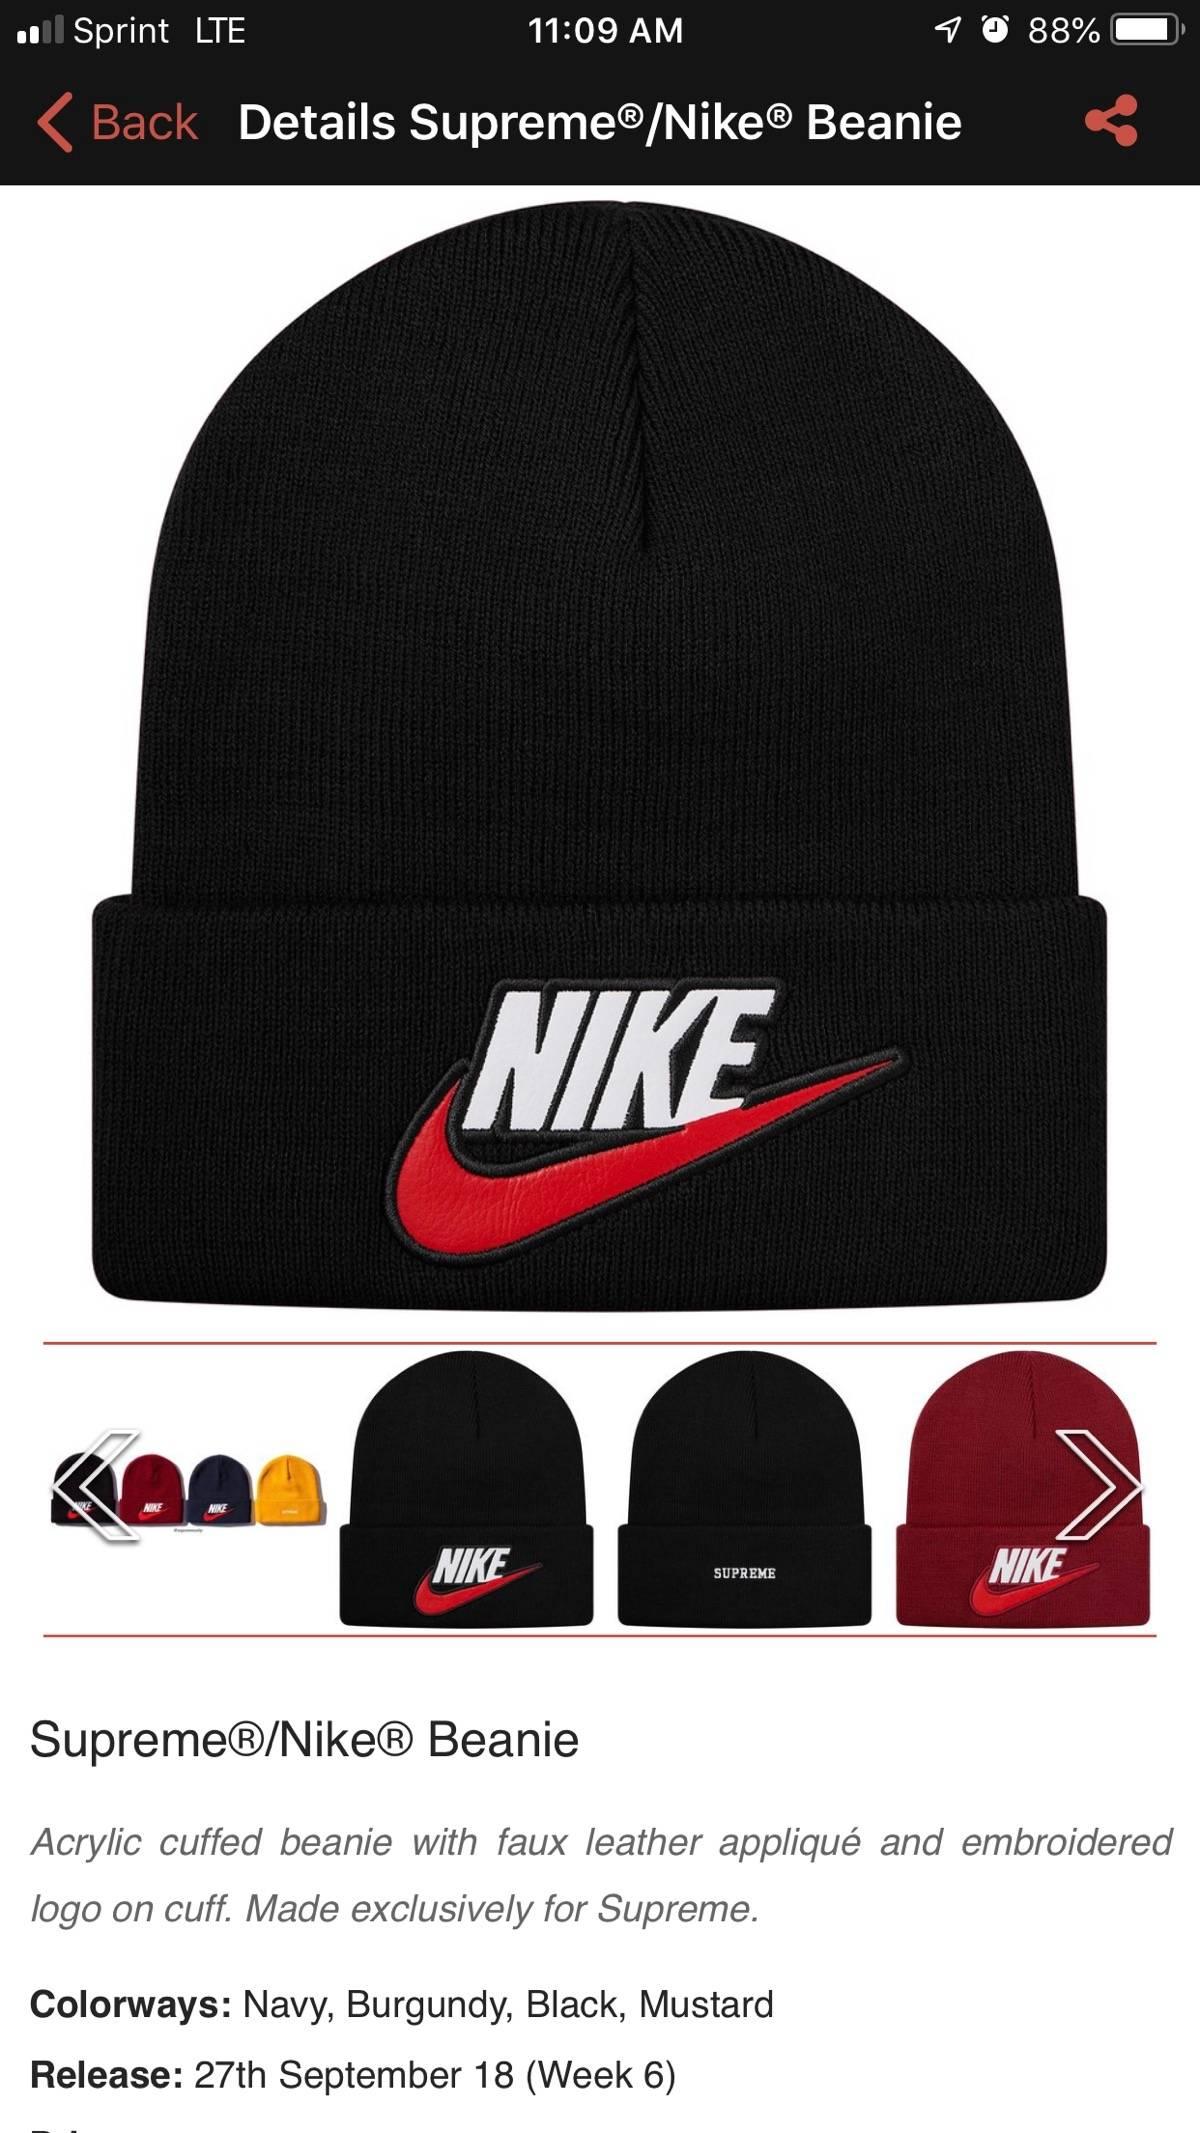 24fede75792 Supreme FW 18 Week 6 Supreme Nike Beanie Black Size one size - Hats for  Sale - Grailed